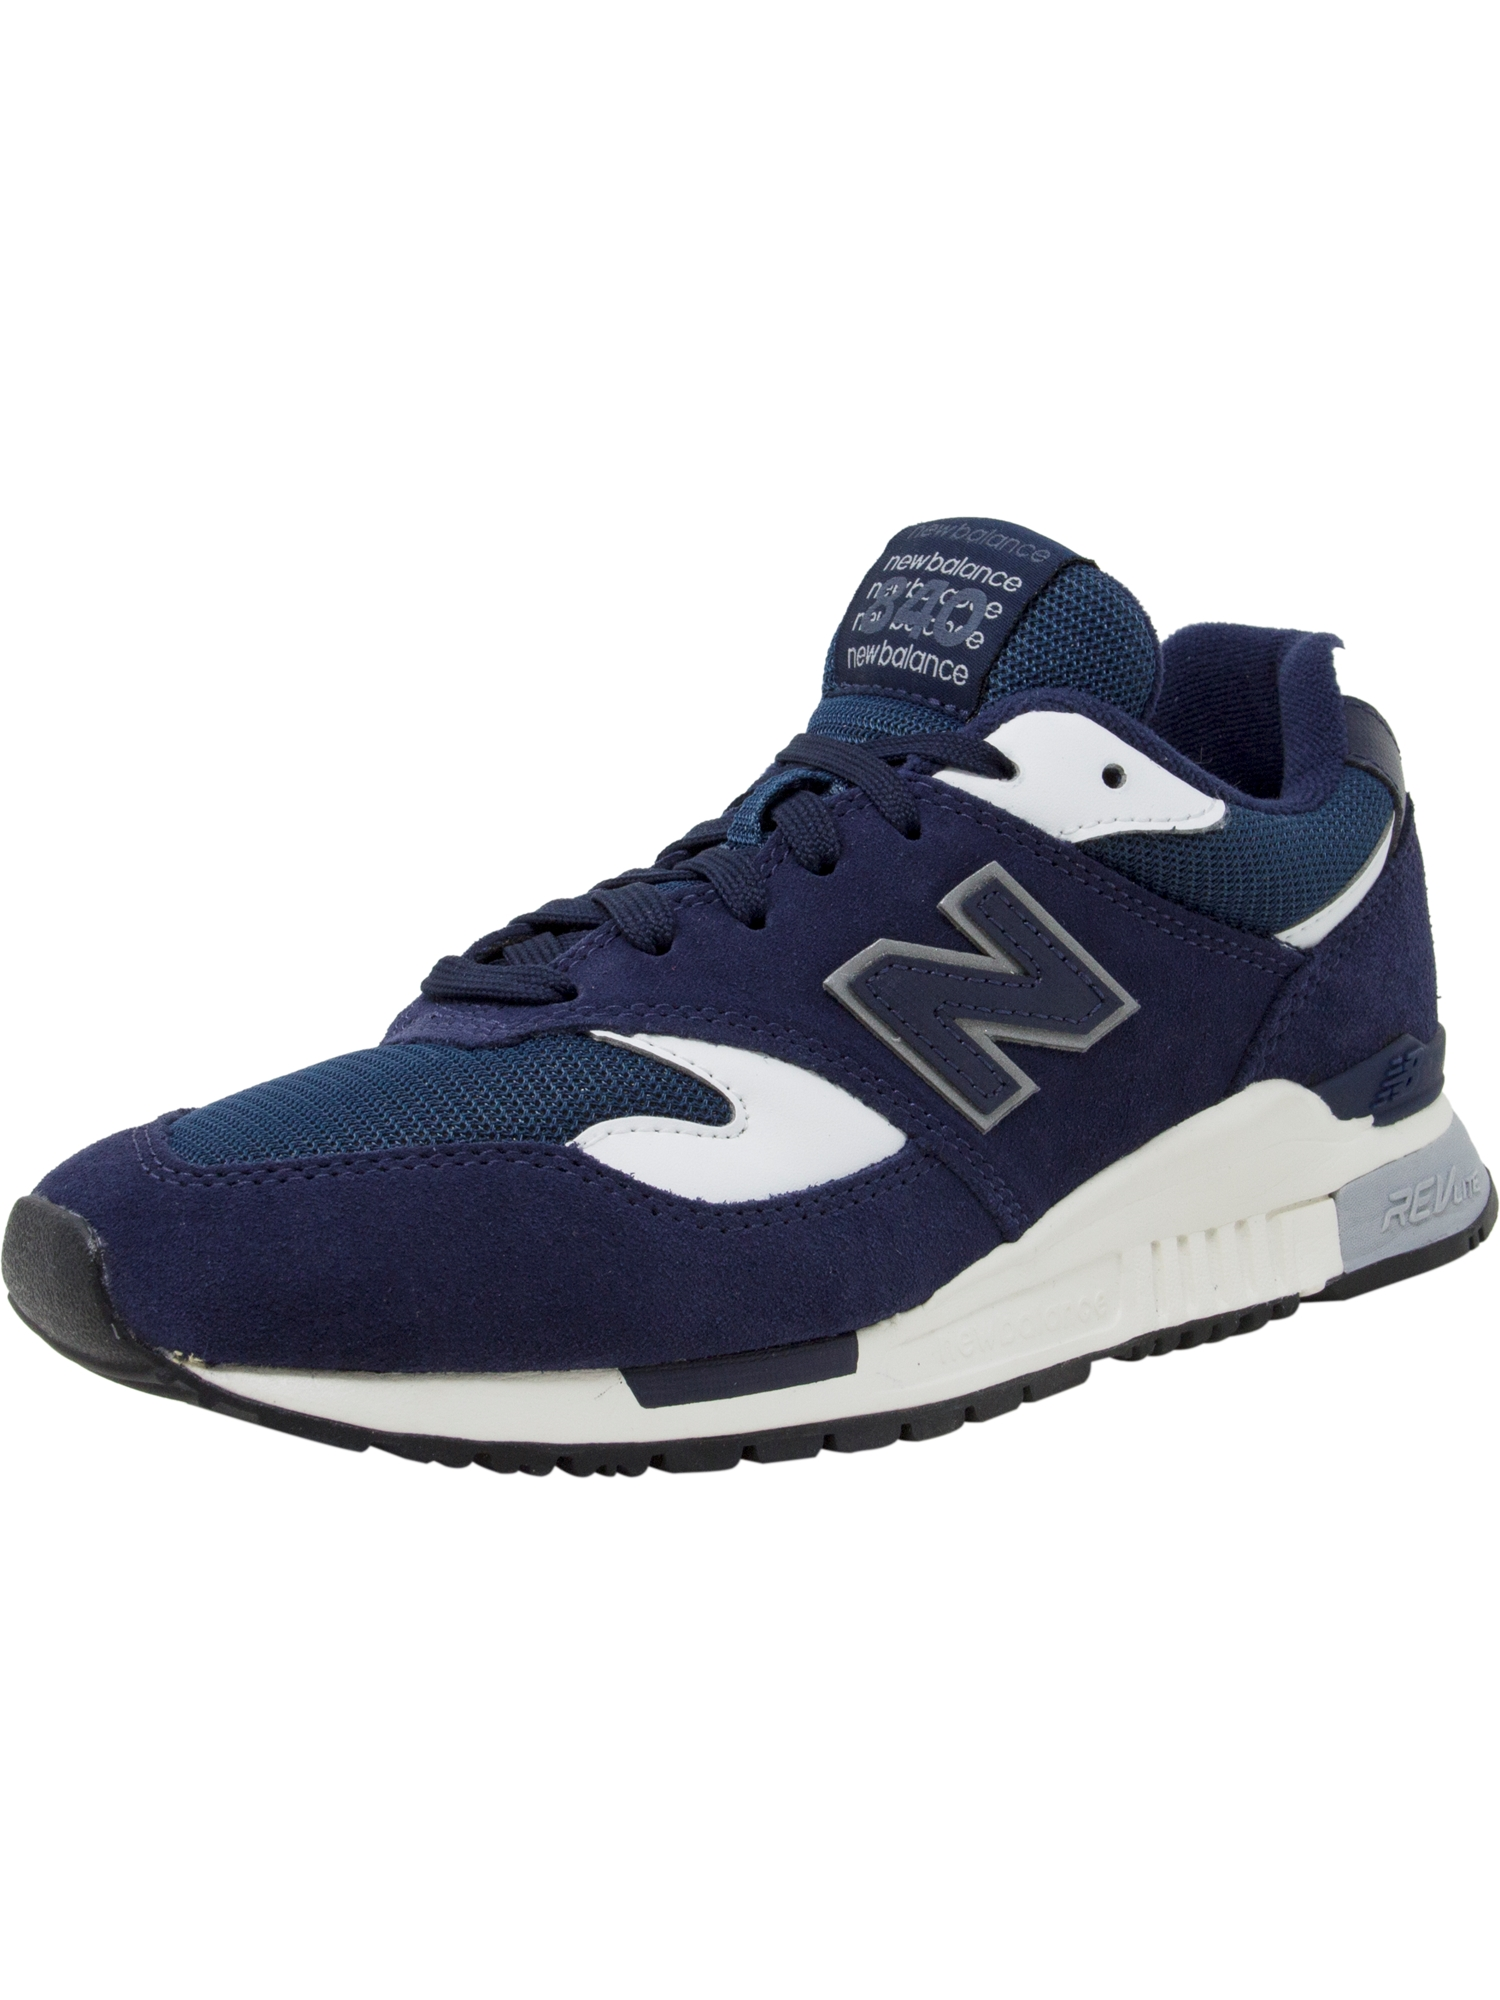 New Balance Men's Ml840 Ag Ankle-High Walking Shoe - 5M